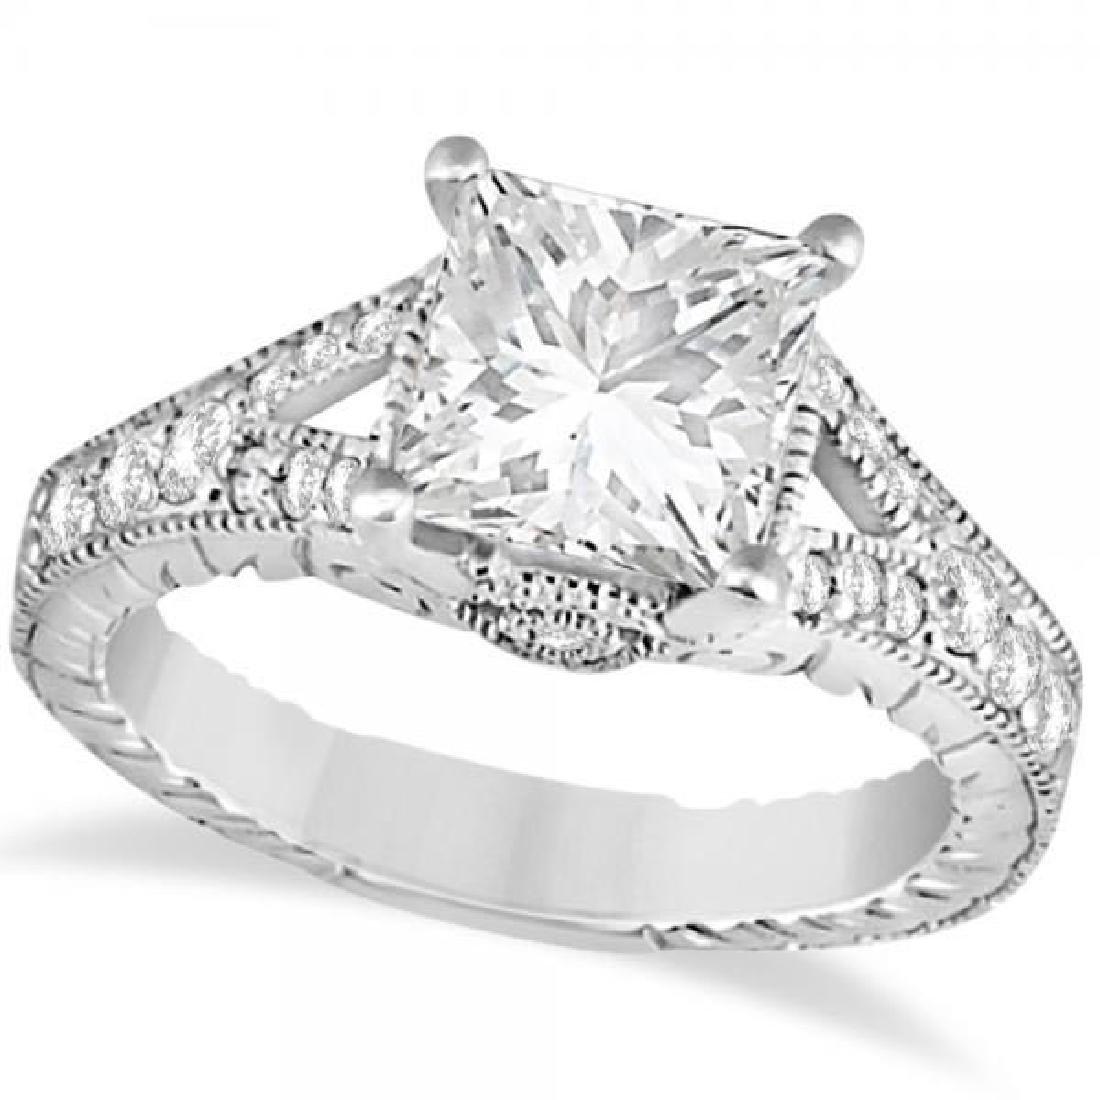 Antique Princess Cut Diamond Engagement Ring 14K White